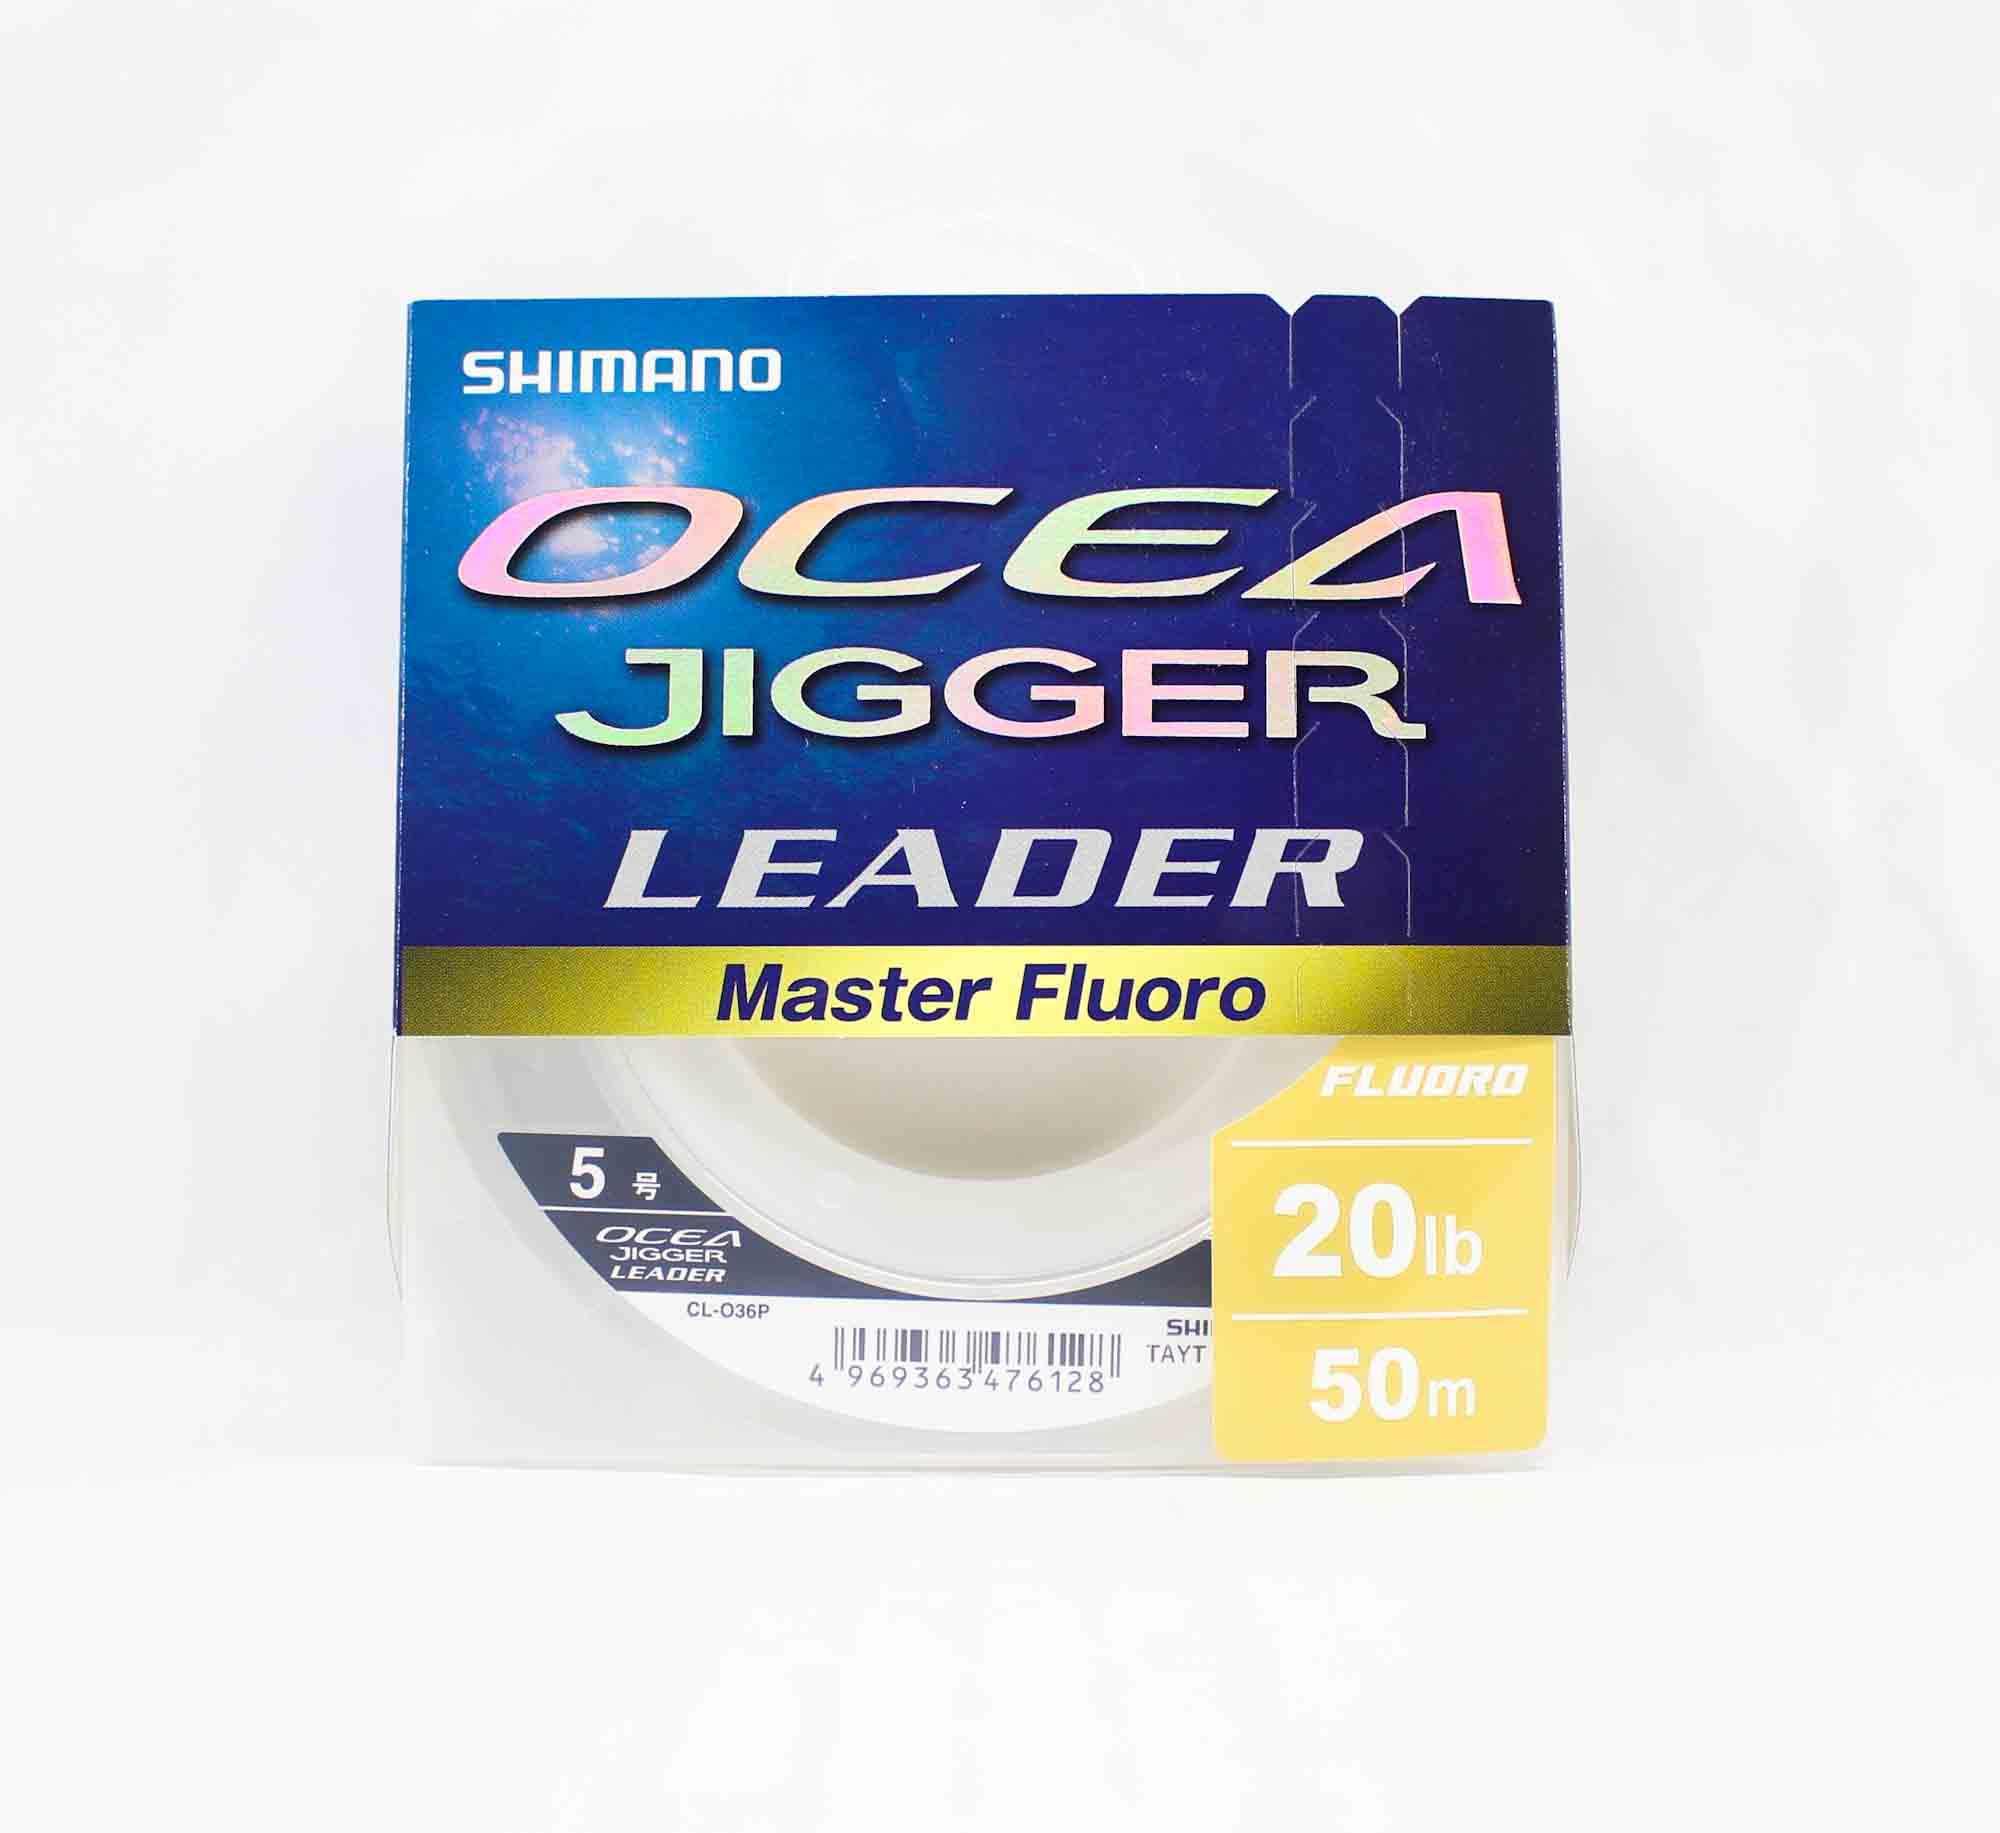 Shimano CL-036P Ocea Jigger Master Fluorocarbon Leader 50m 20lb 476128